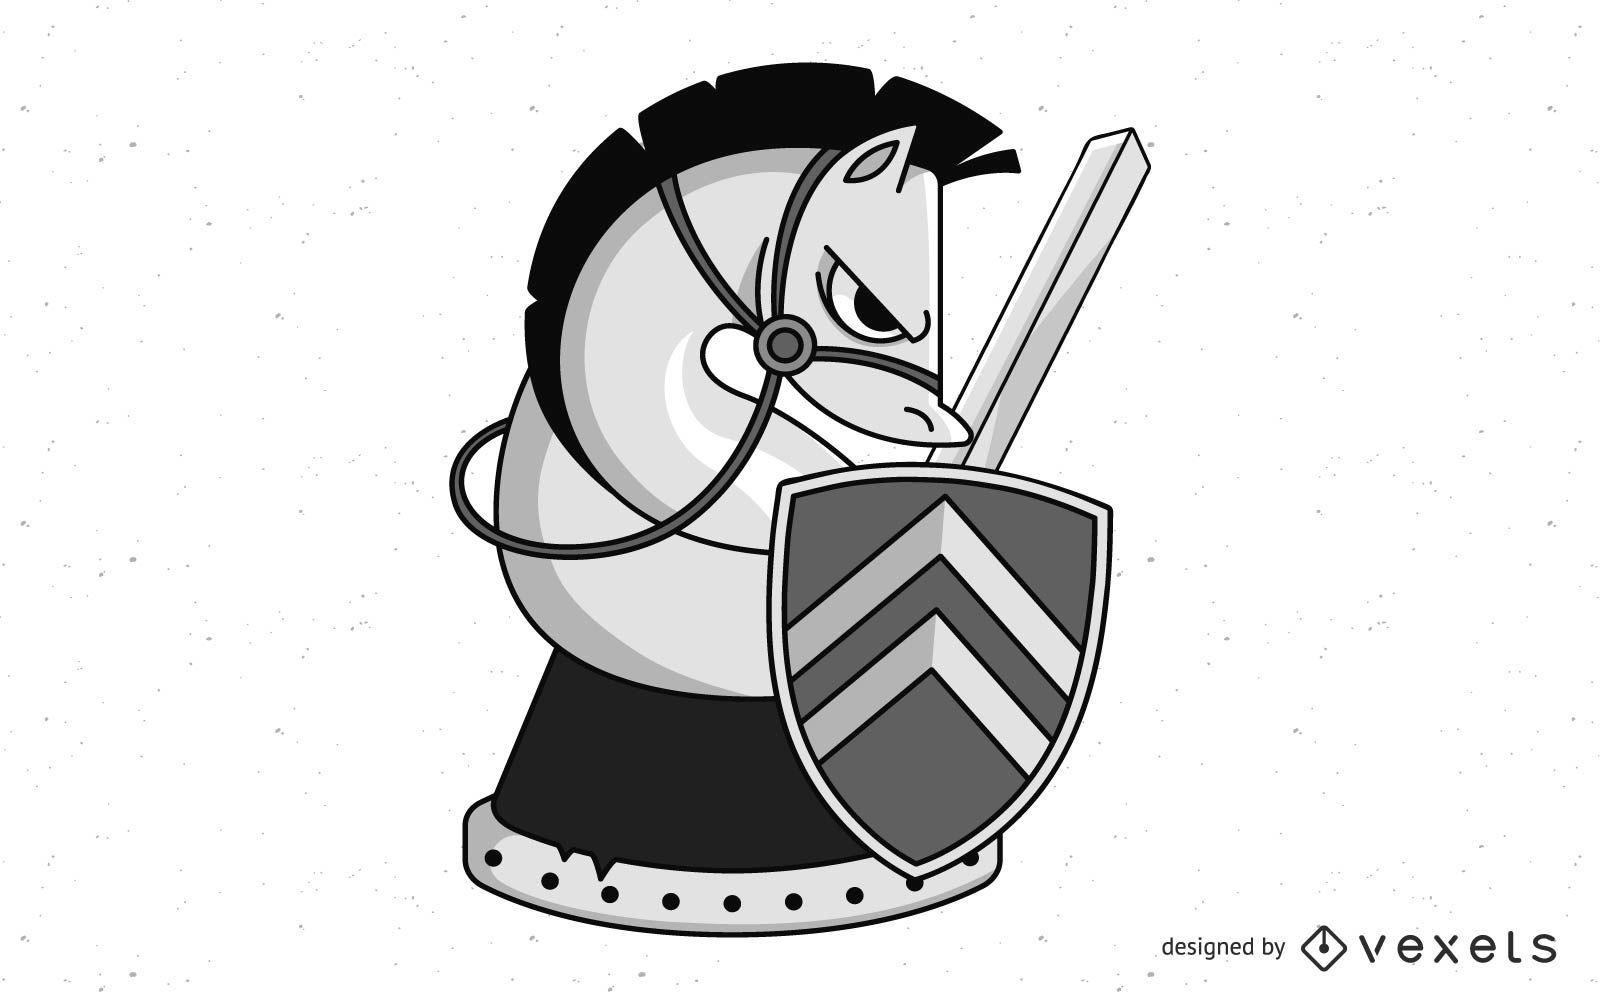 Chess Knight Horse Piece Design